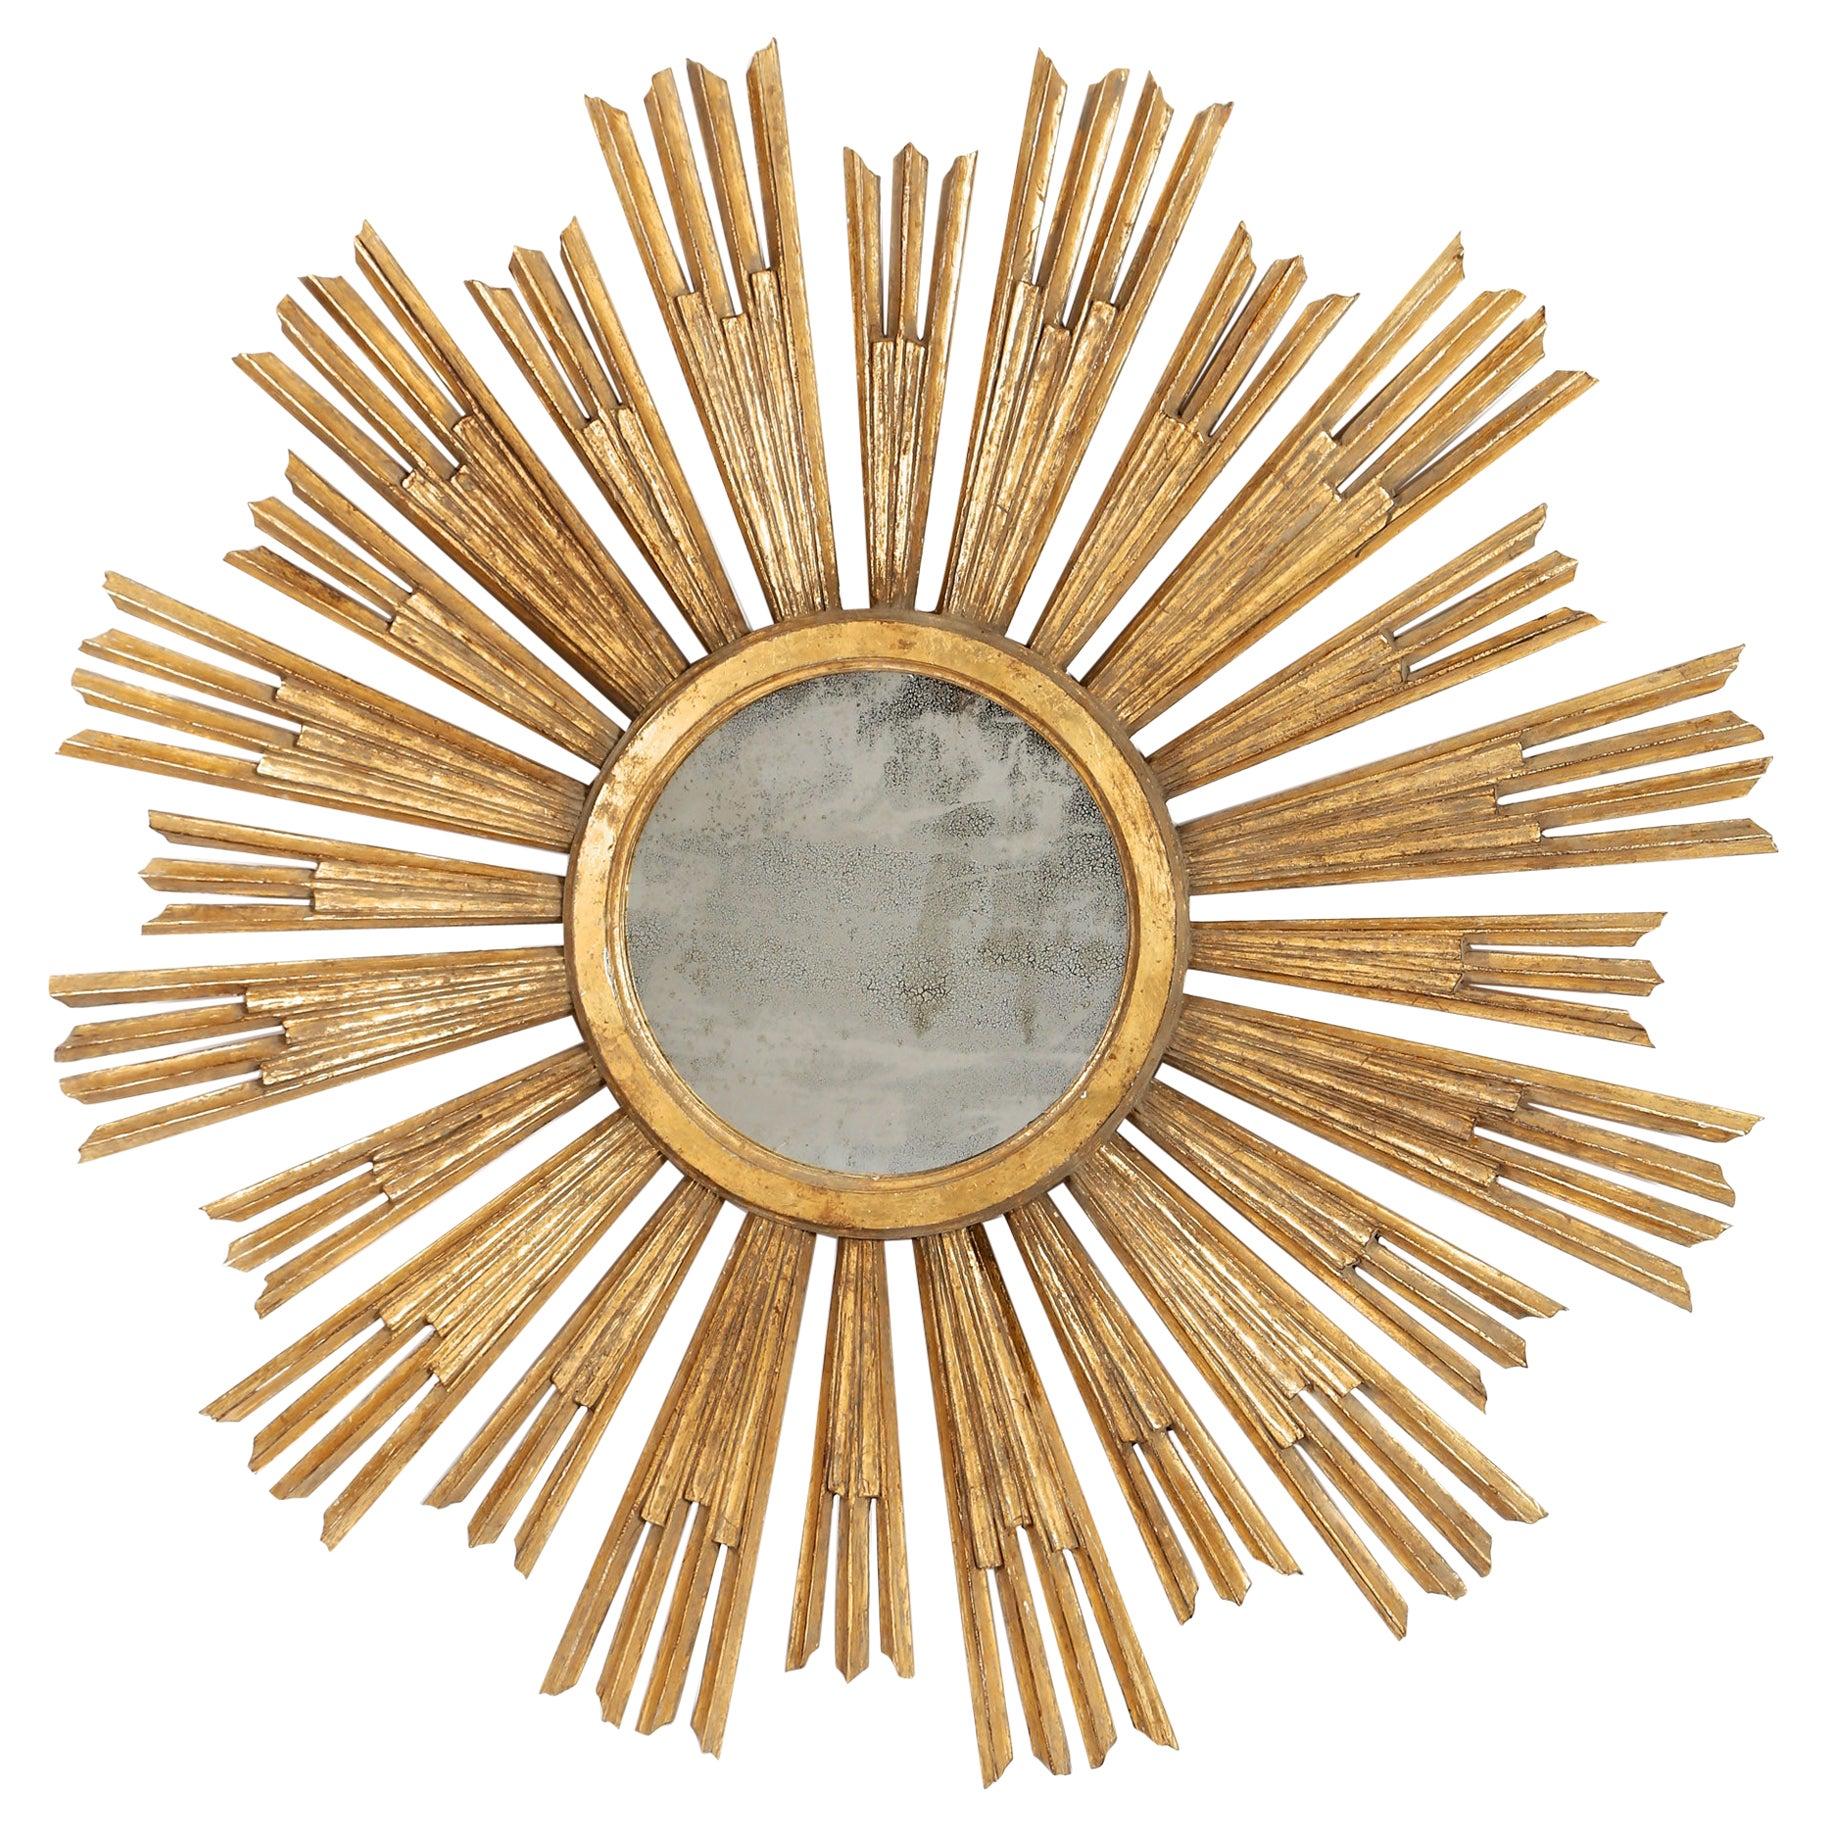 Italian Early 20th Century Gold Giltwood Sunburst Mirror of Large Scale